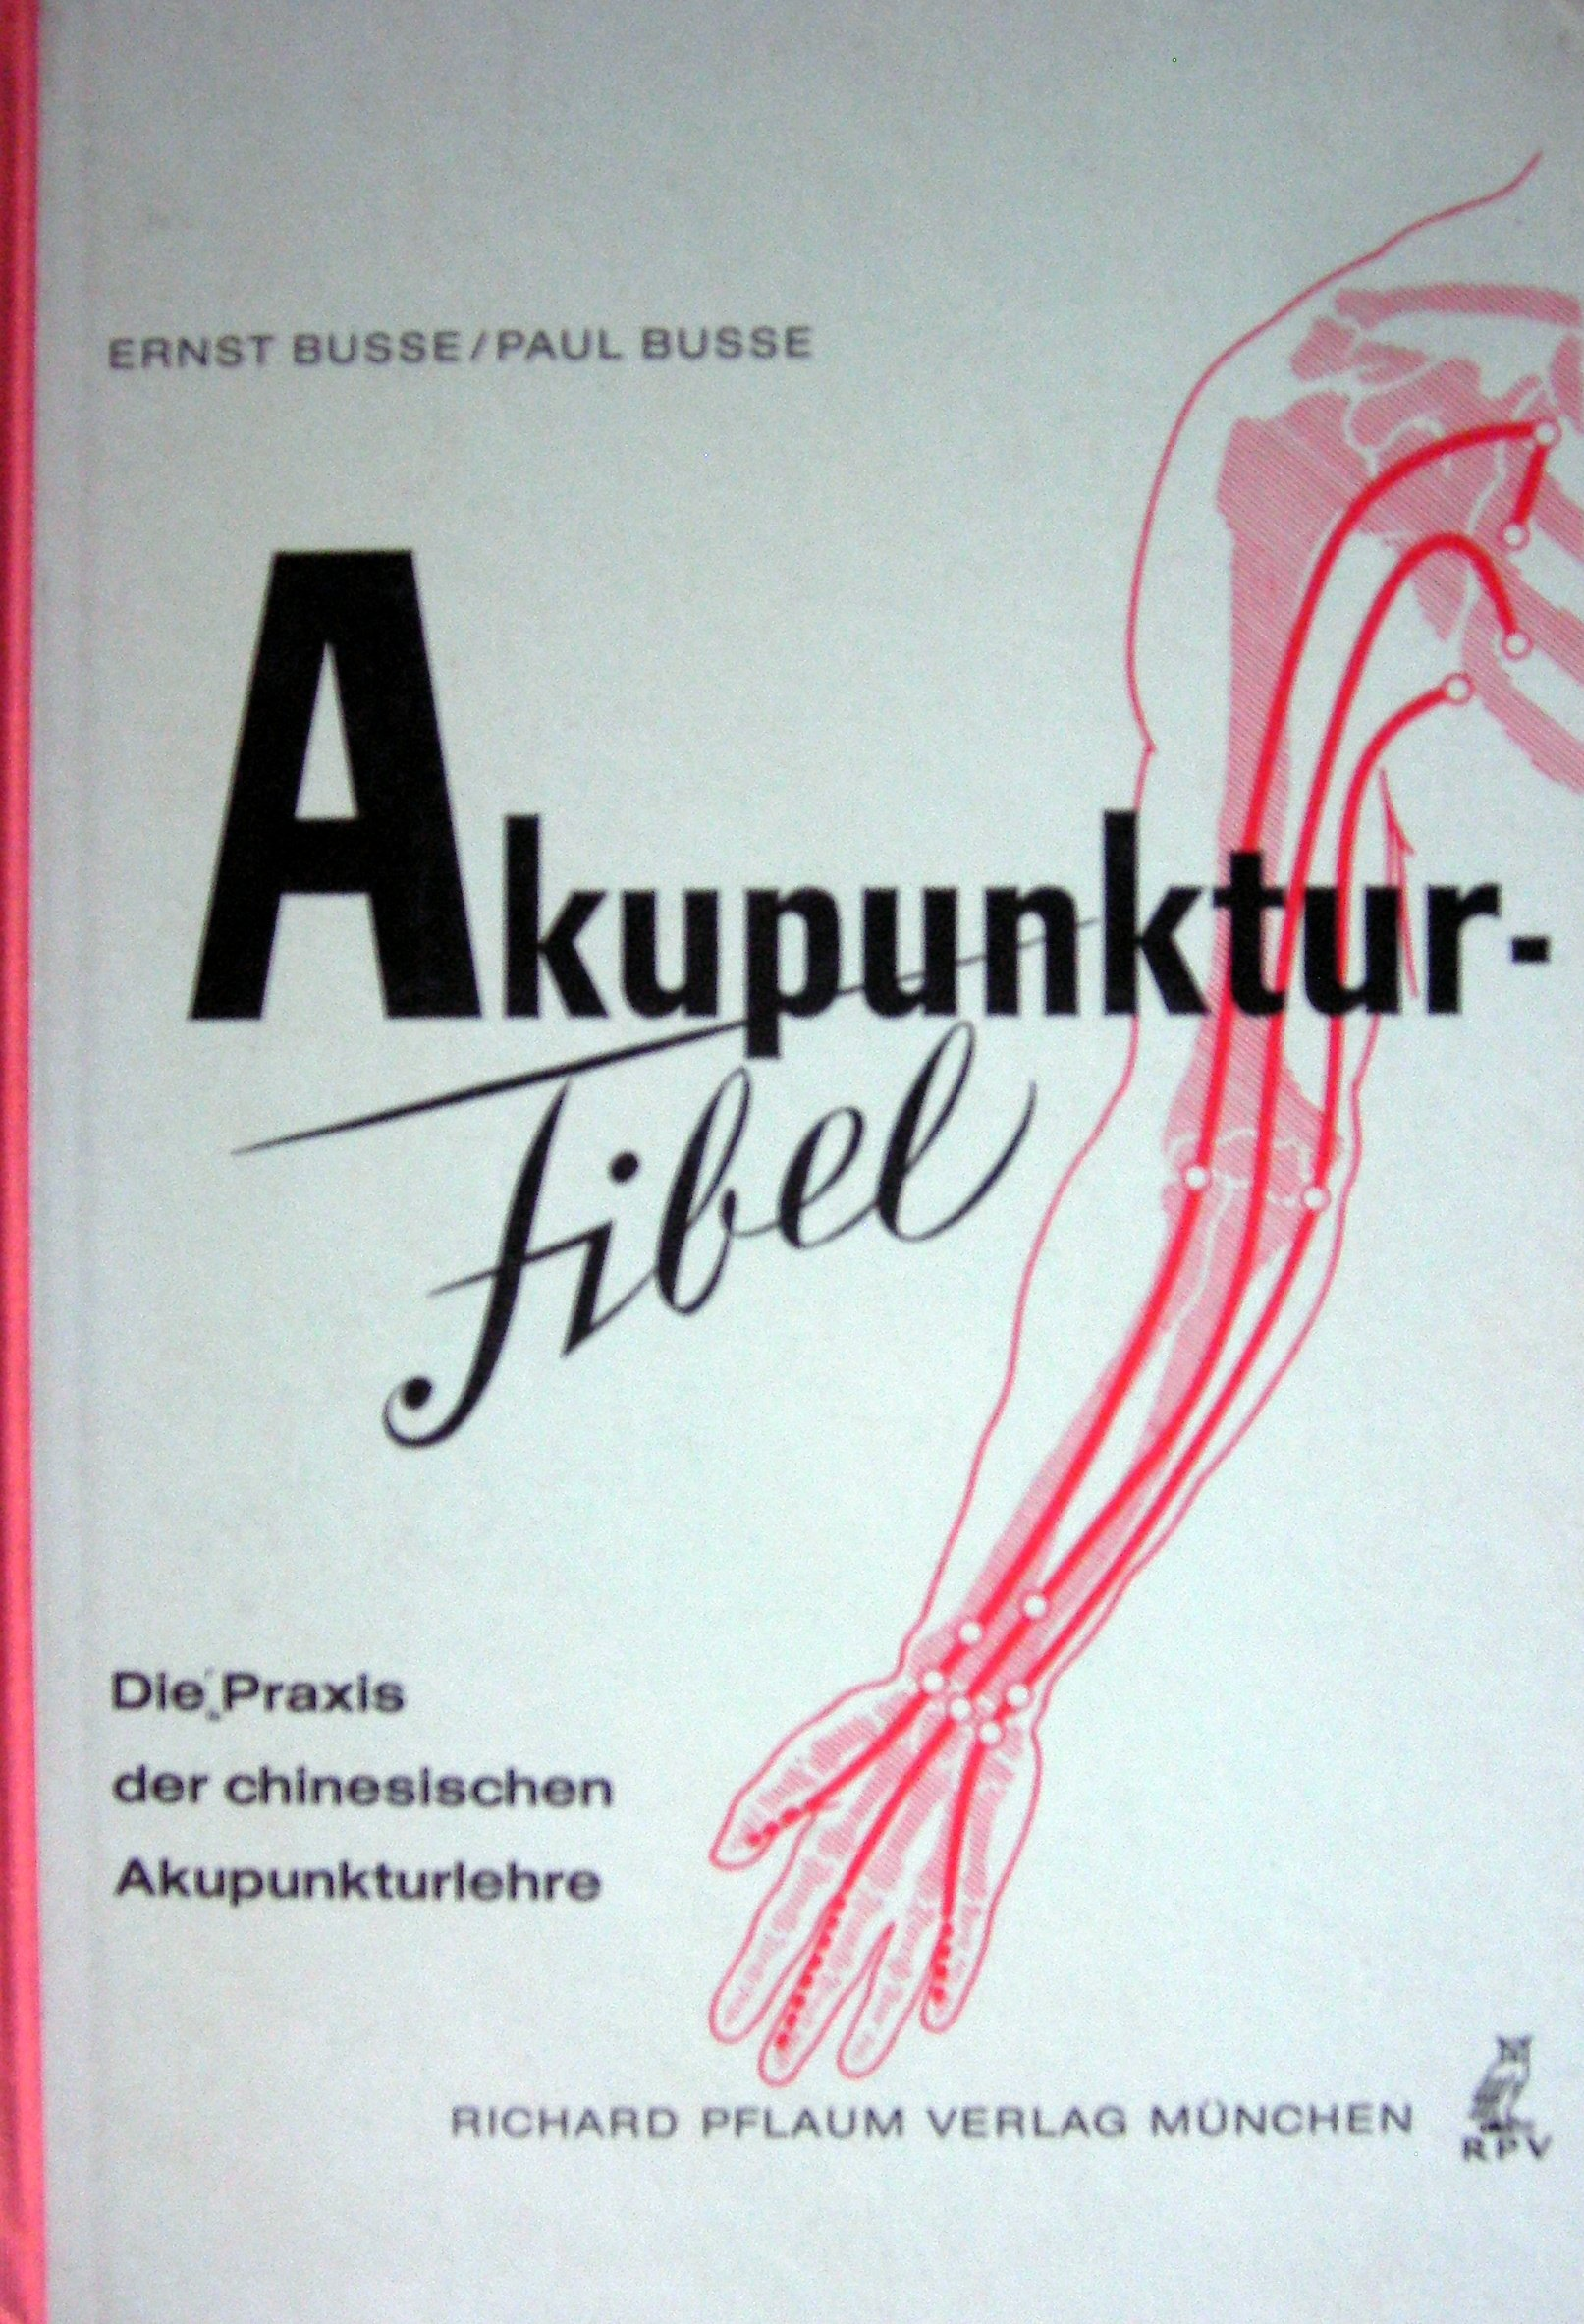 Akupunktur-Fibel